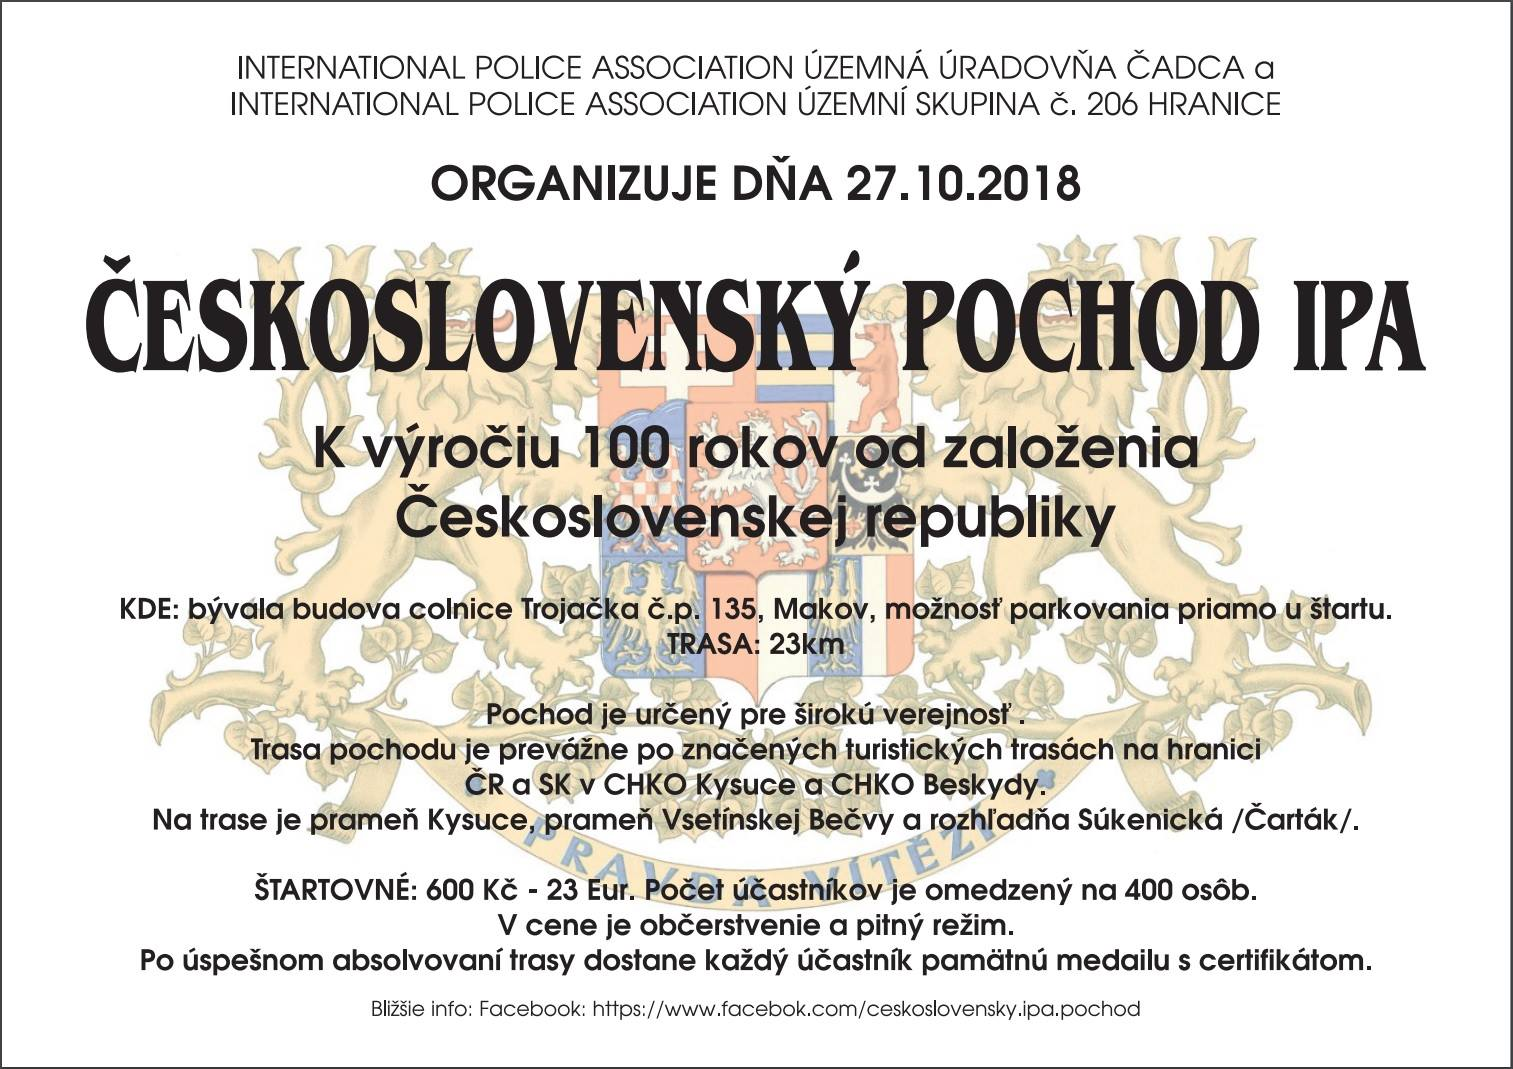 Československý IPA pochod 2018, Slovensko